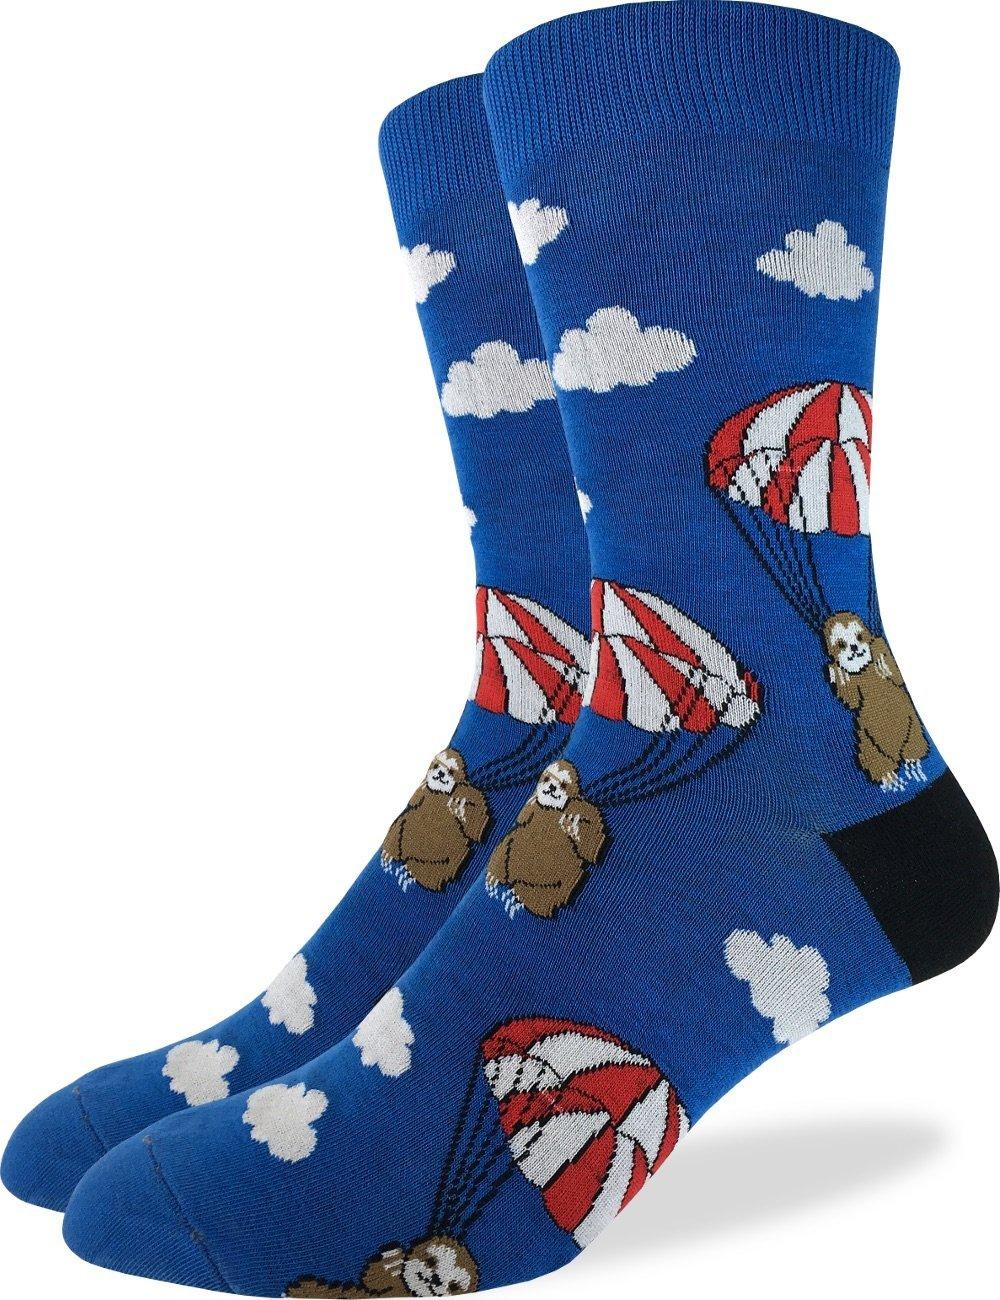 Good Luck Sock Men'S Parachuting Sloths Crew Socks - Blue, Shoe Size 7-12 -